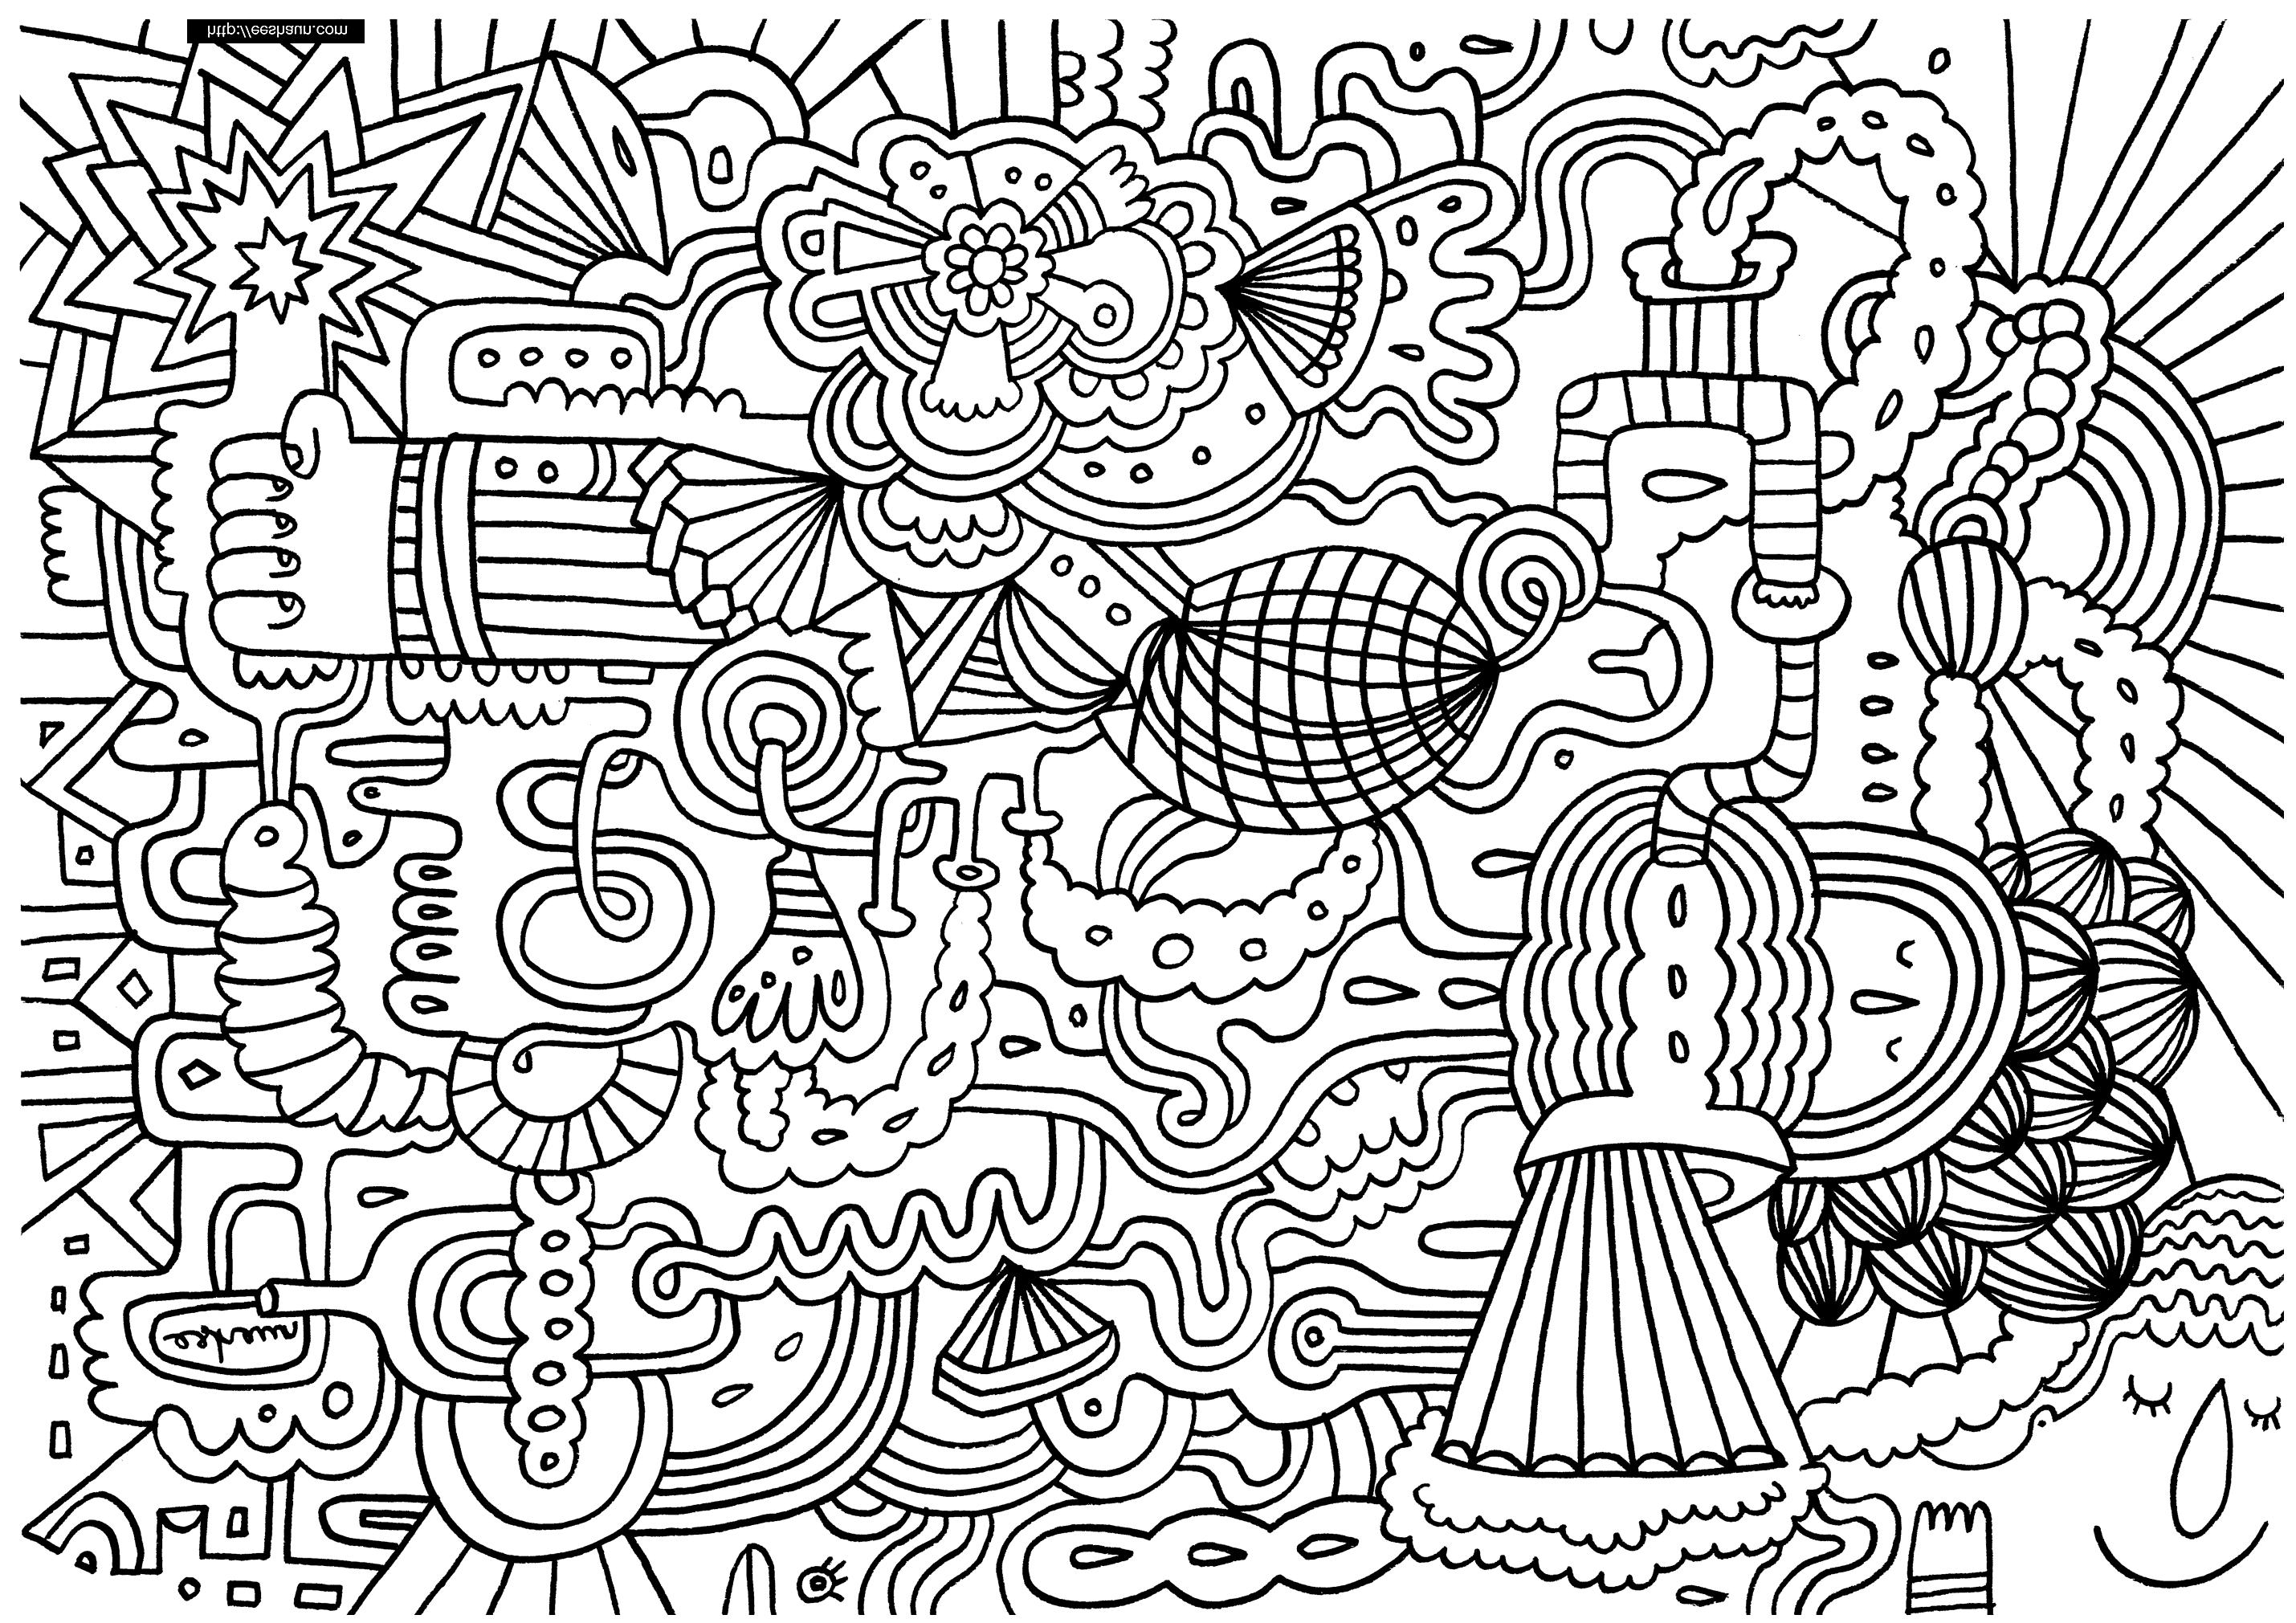 Doodle art doodling 2 - Doodle Art / Doodling Adult ...